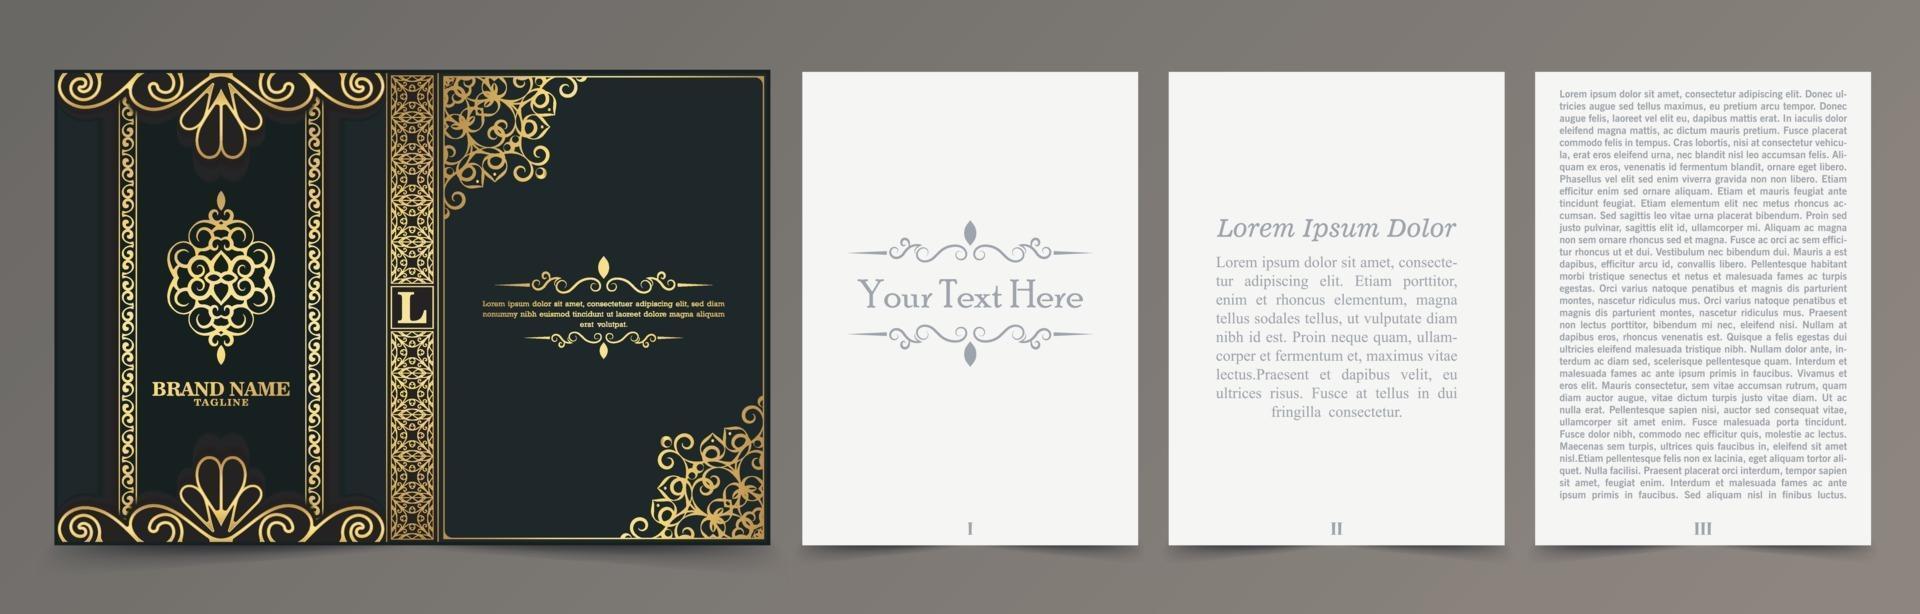 lyx prydnads bokomslag design vektor